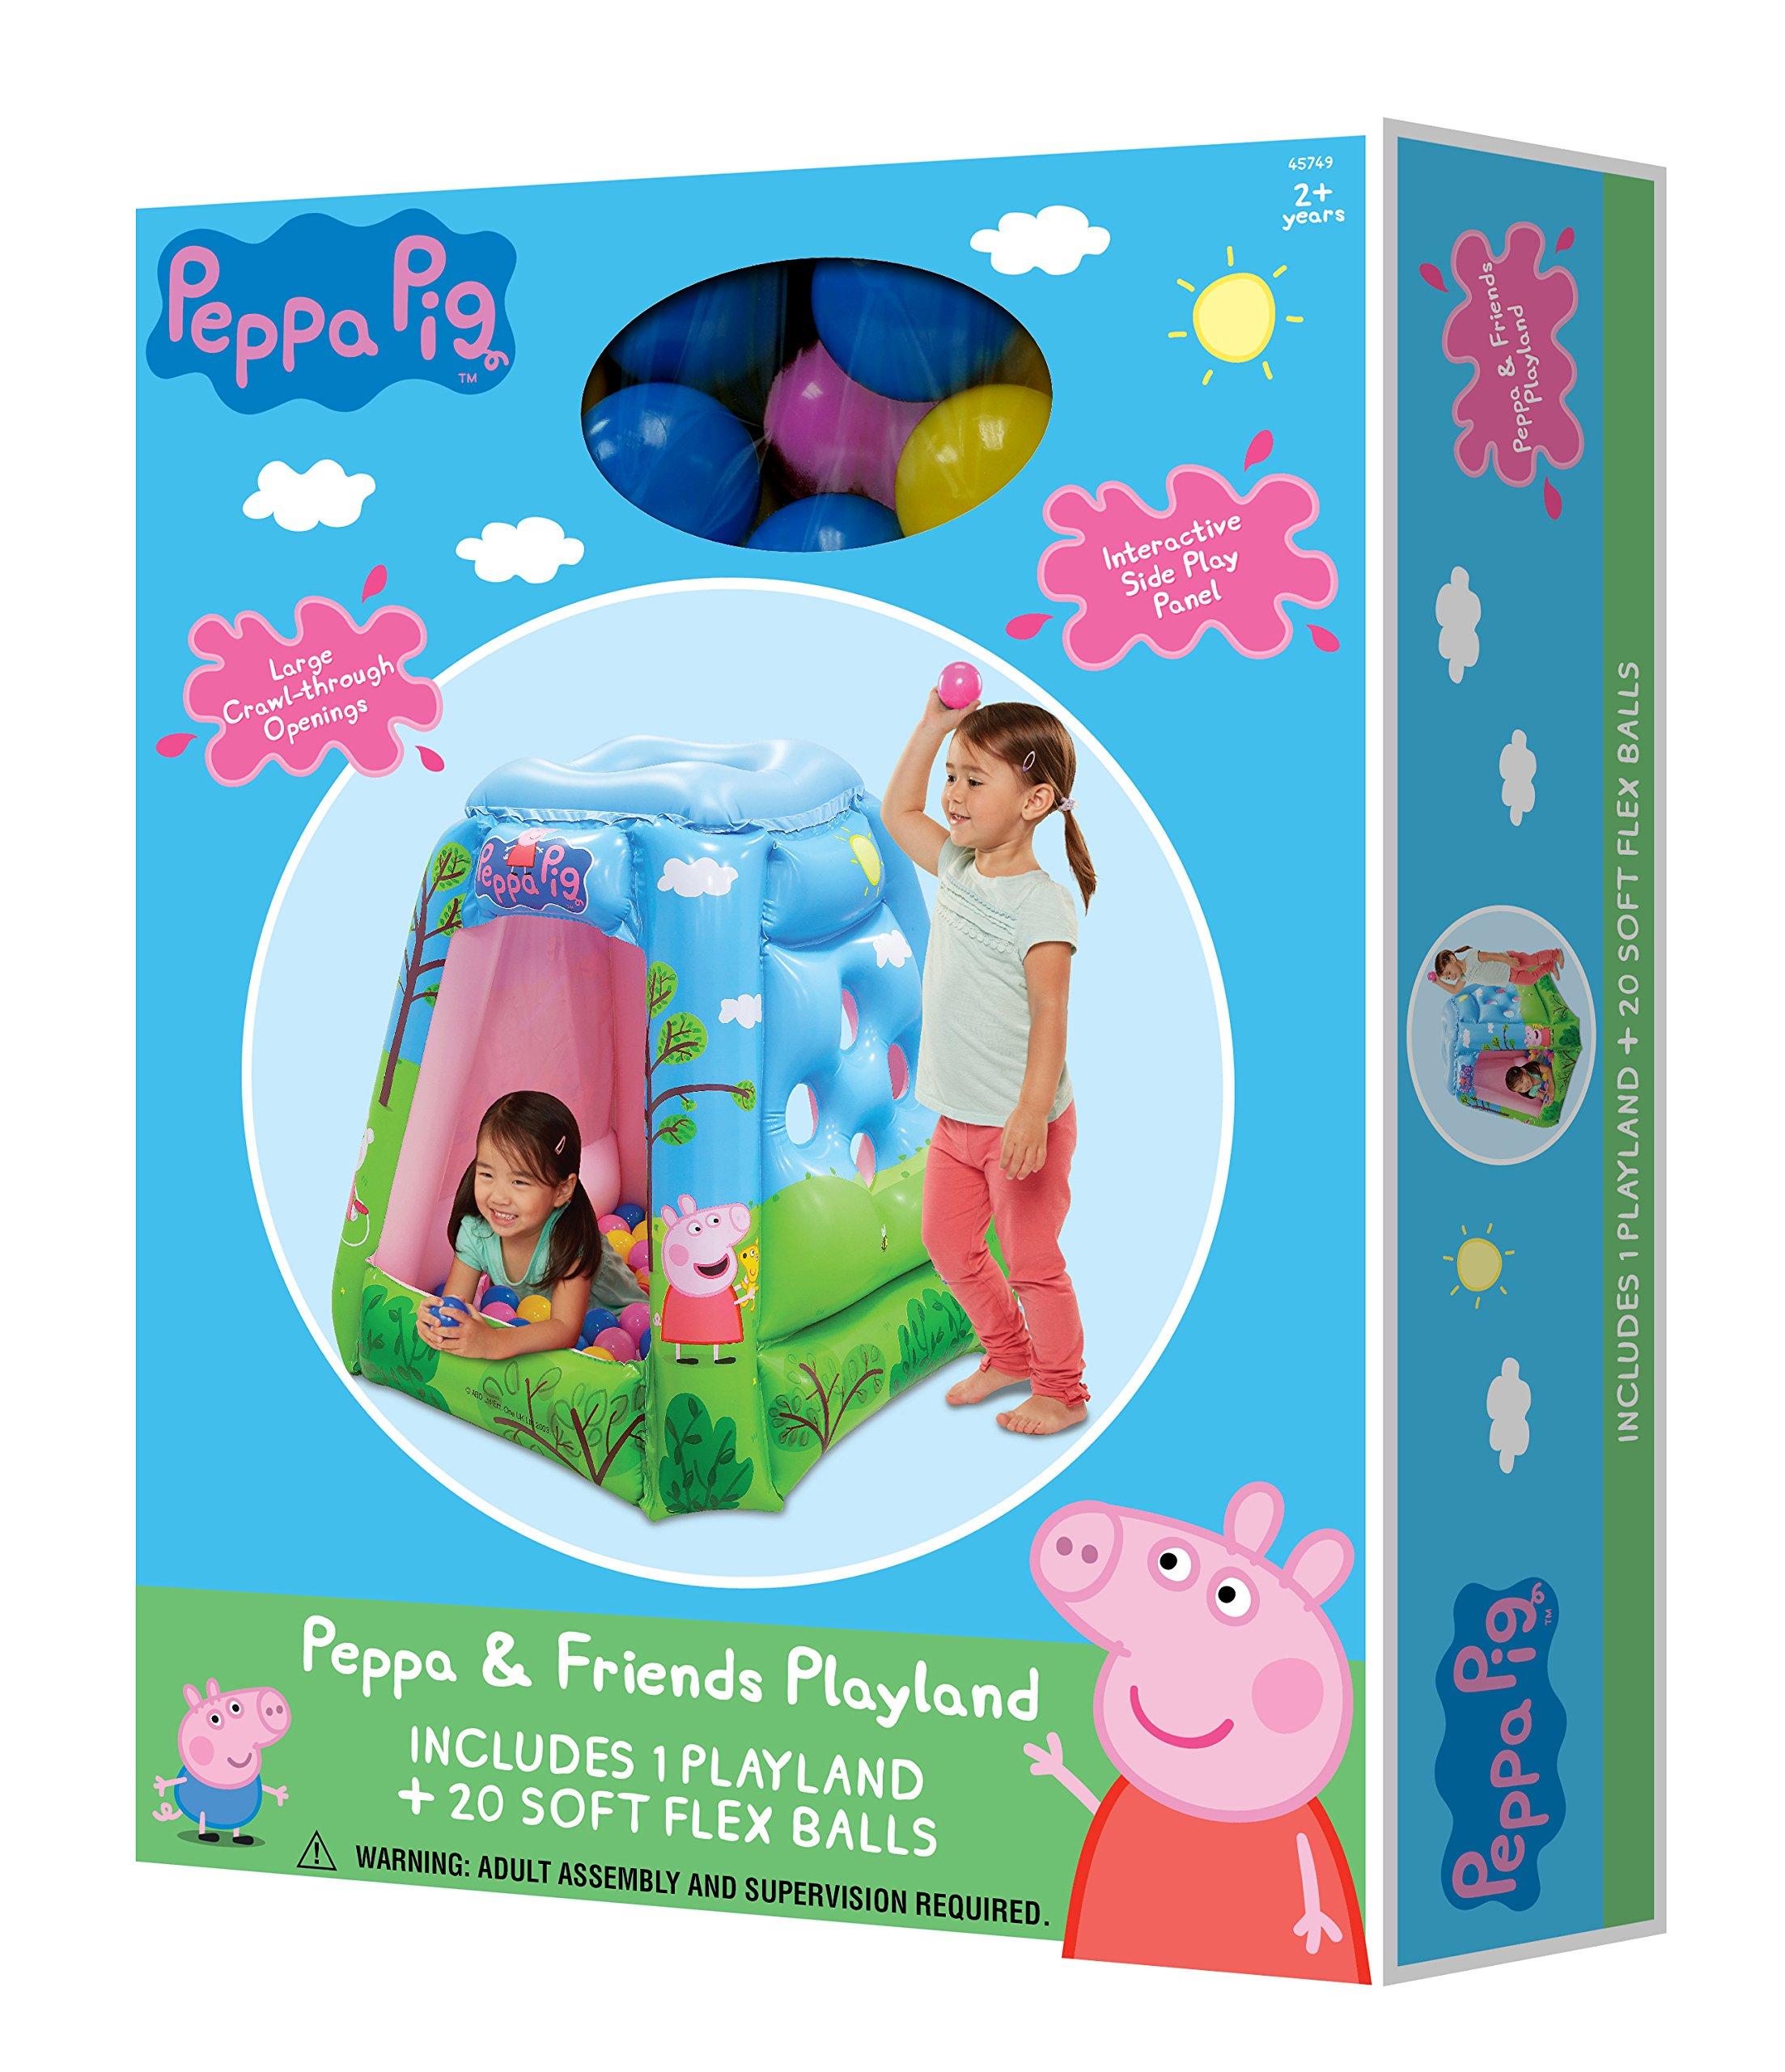 Peppa Pig Ball Pit, 1 Inflatable & 20 Sof-Flex Balls, Blue/Green, 37''W x 37''D x 34''H by Peppa Pig (Image #3)